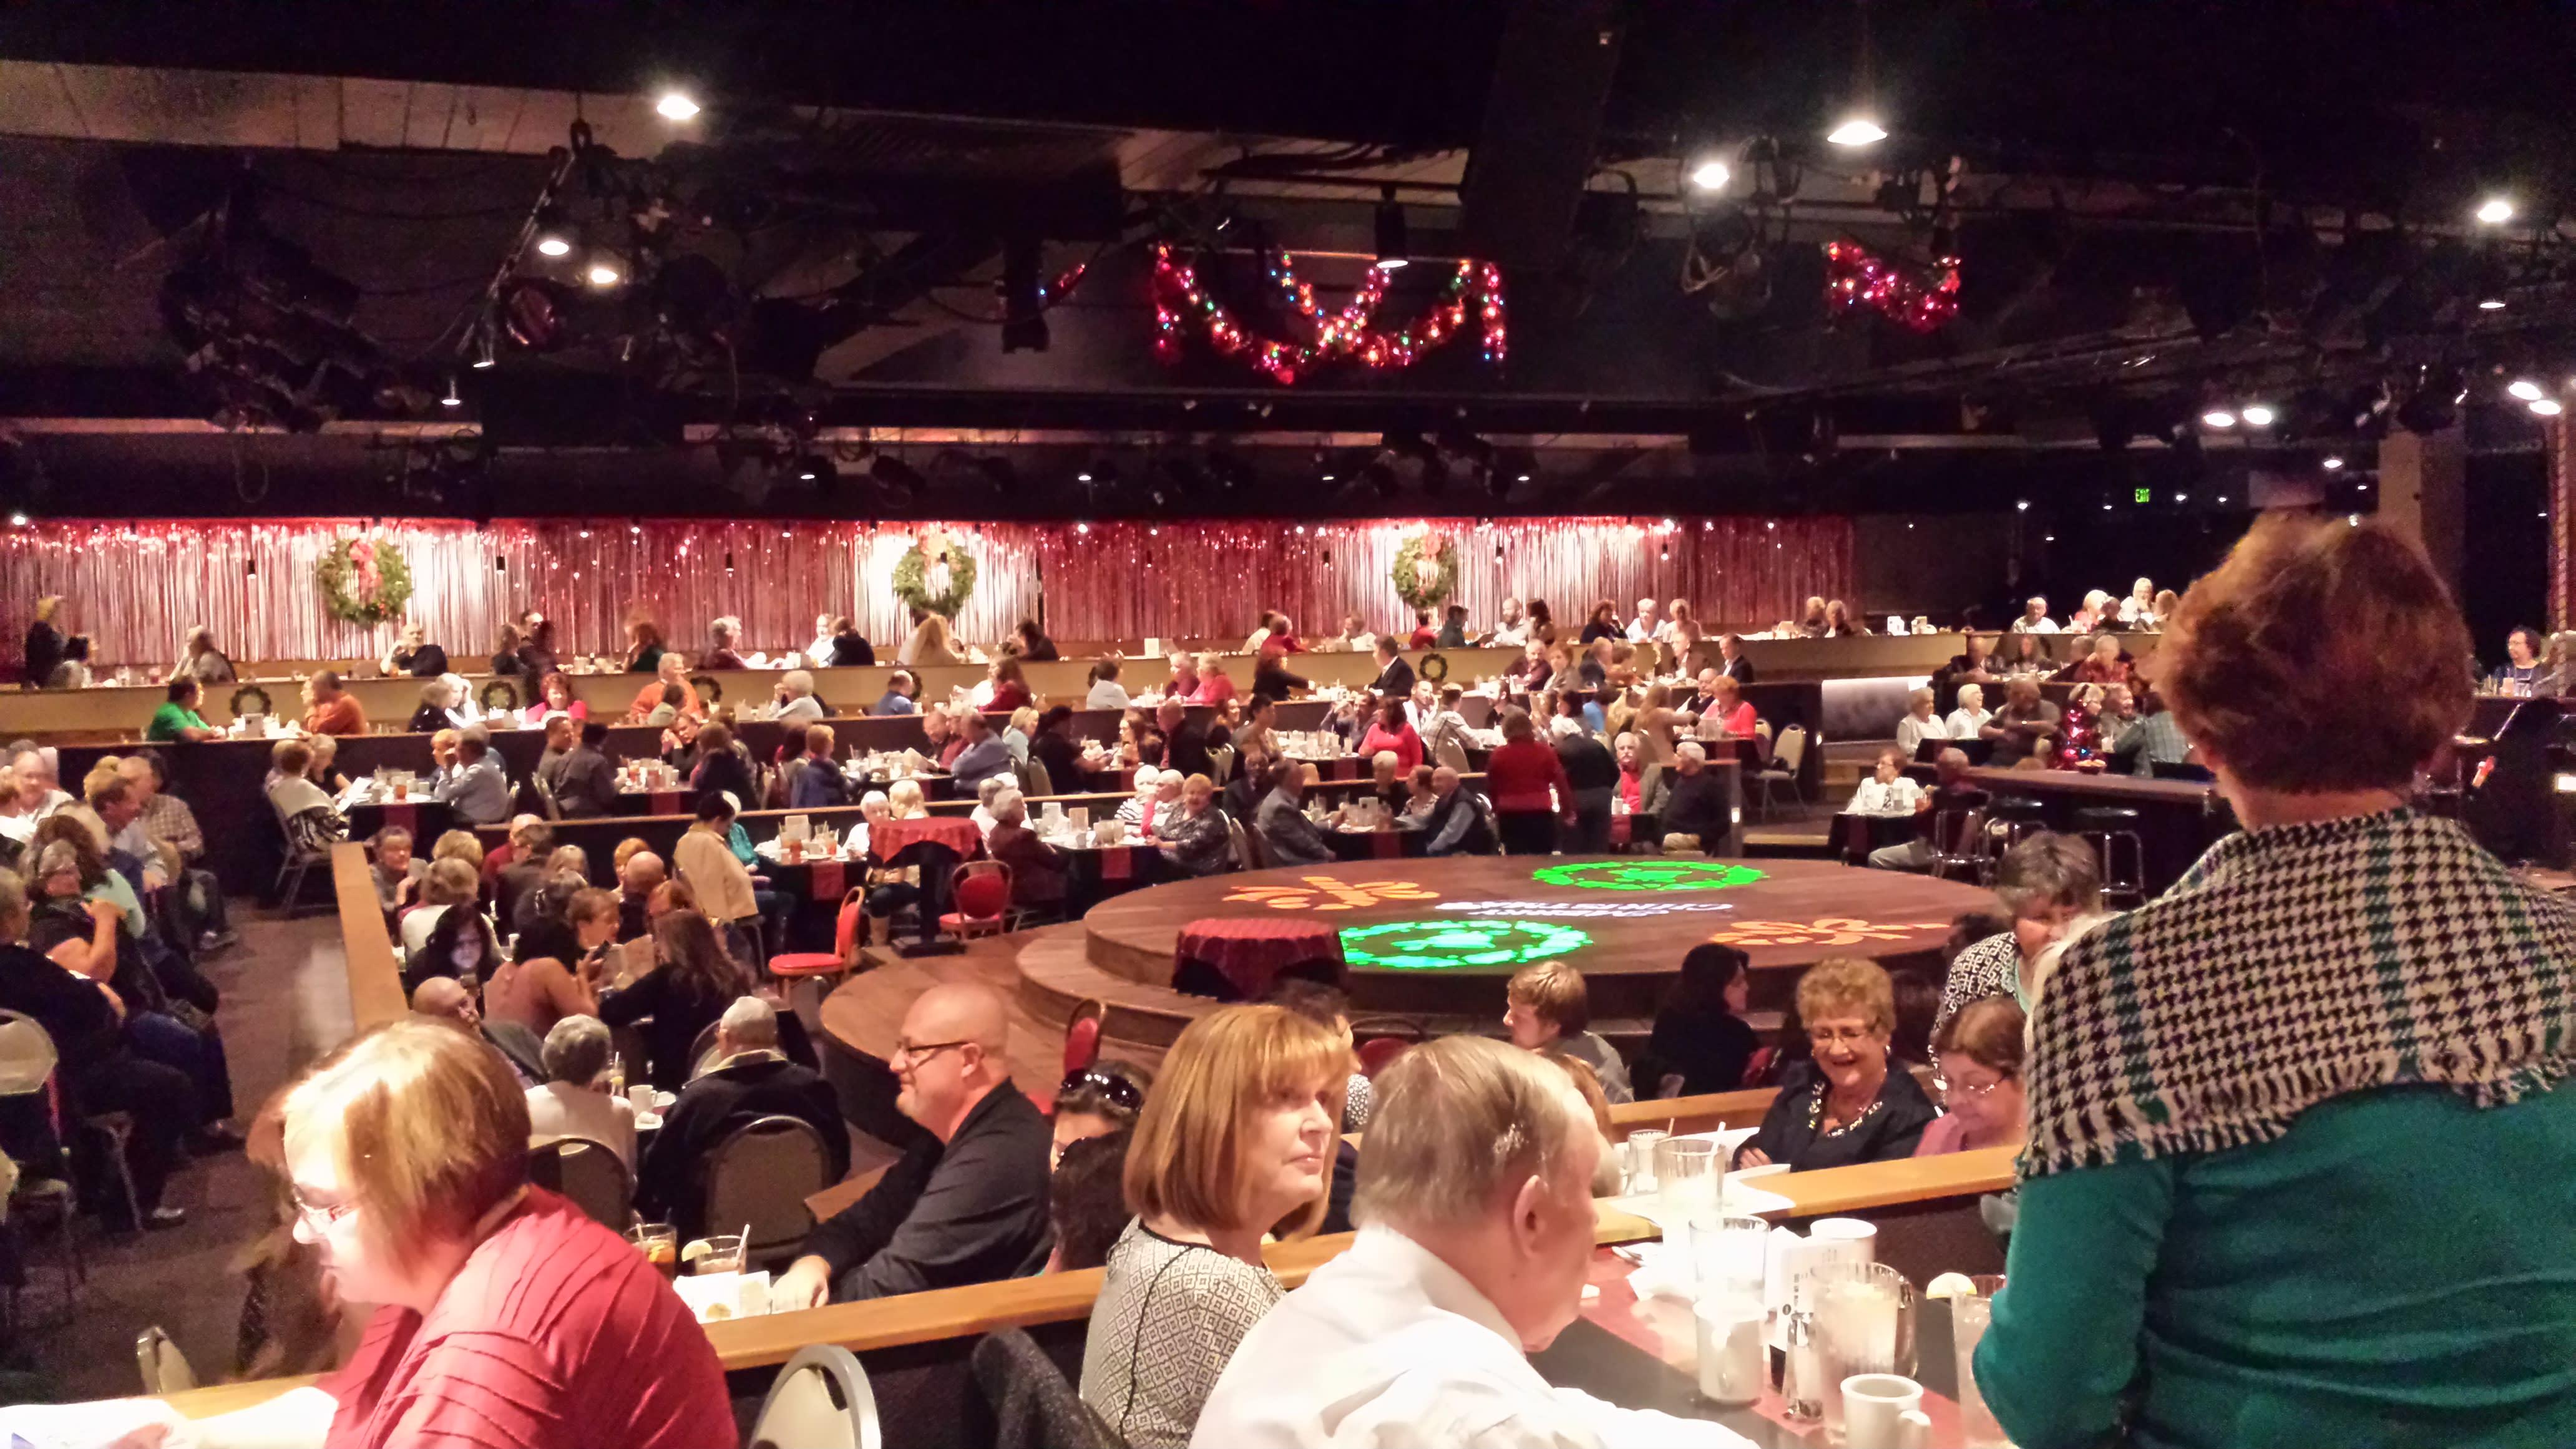 derby-dinner-inside-christmastime